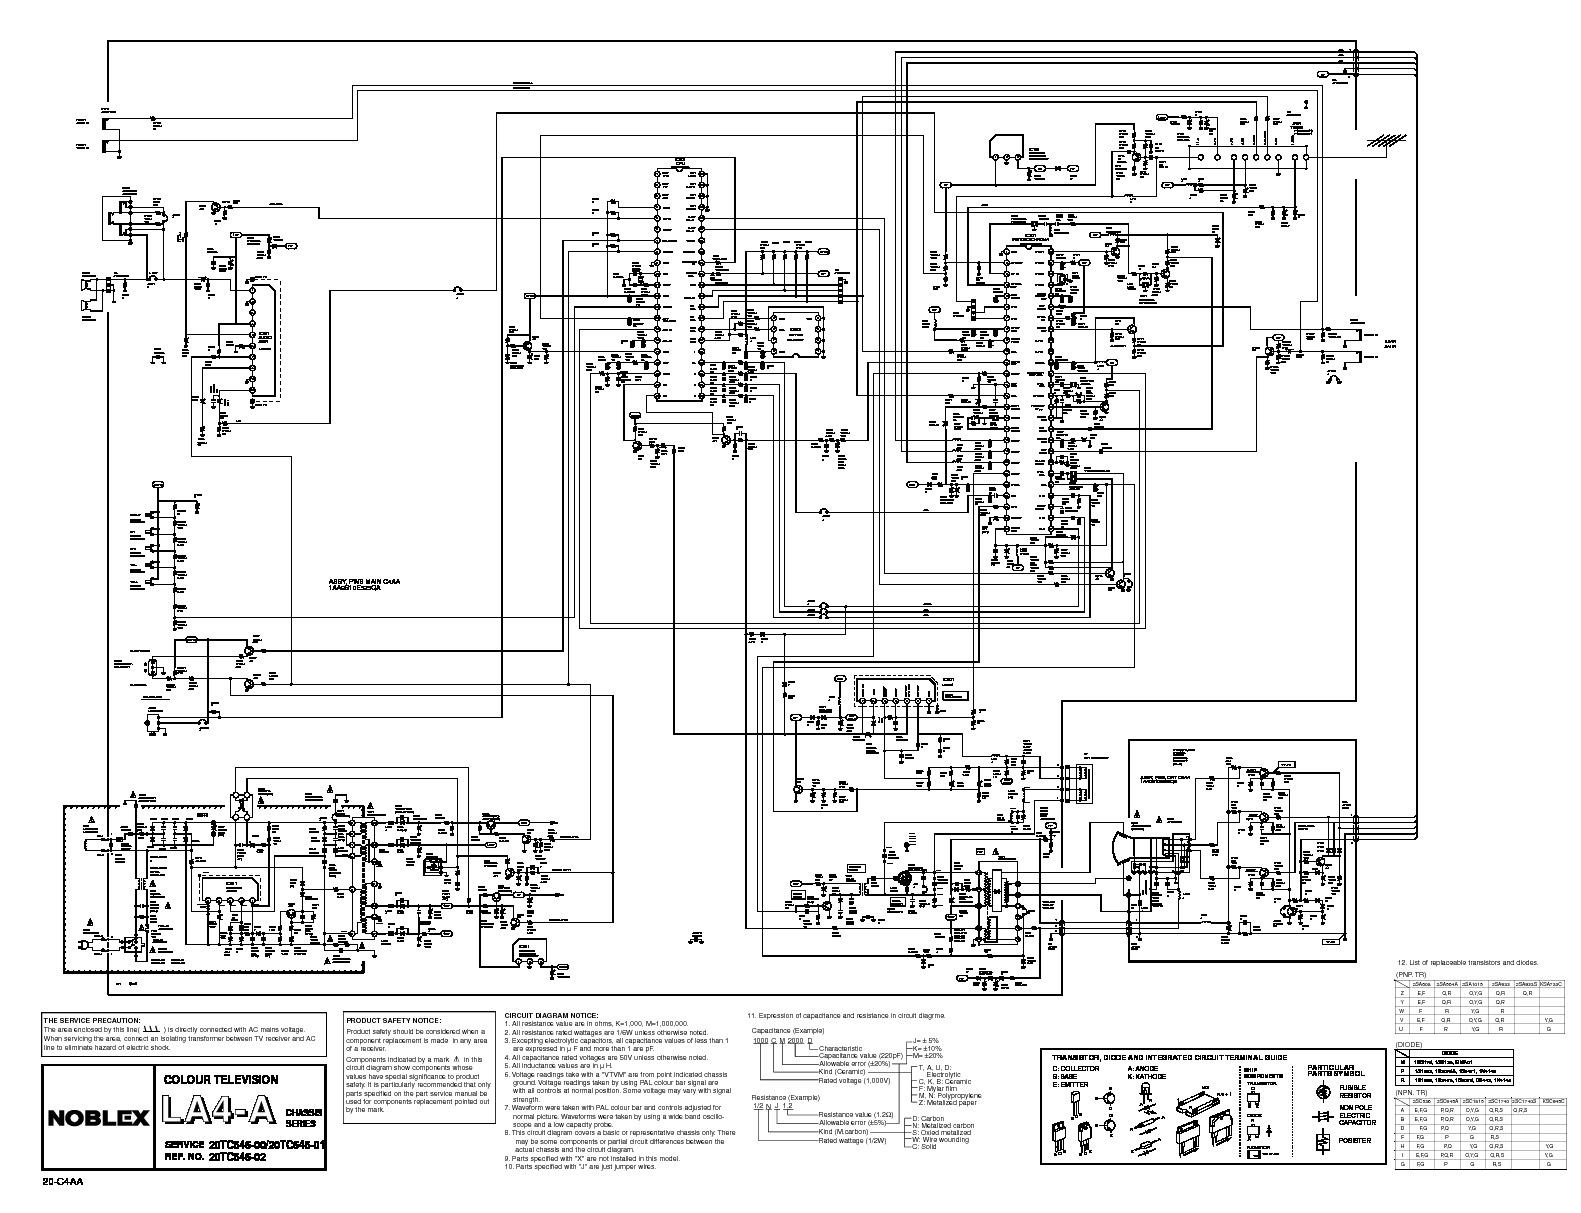 7052f2_20tc646-la-4apdf.pdf